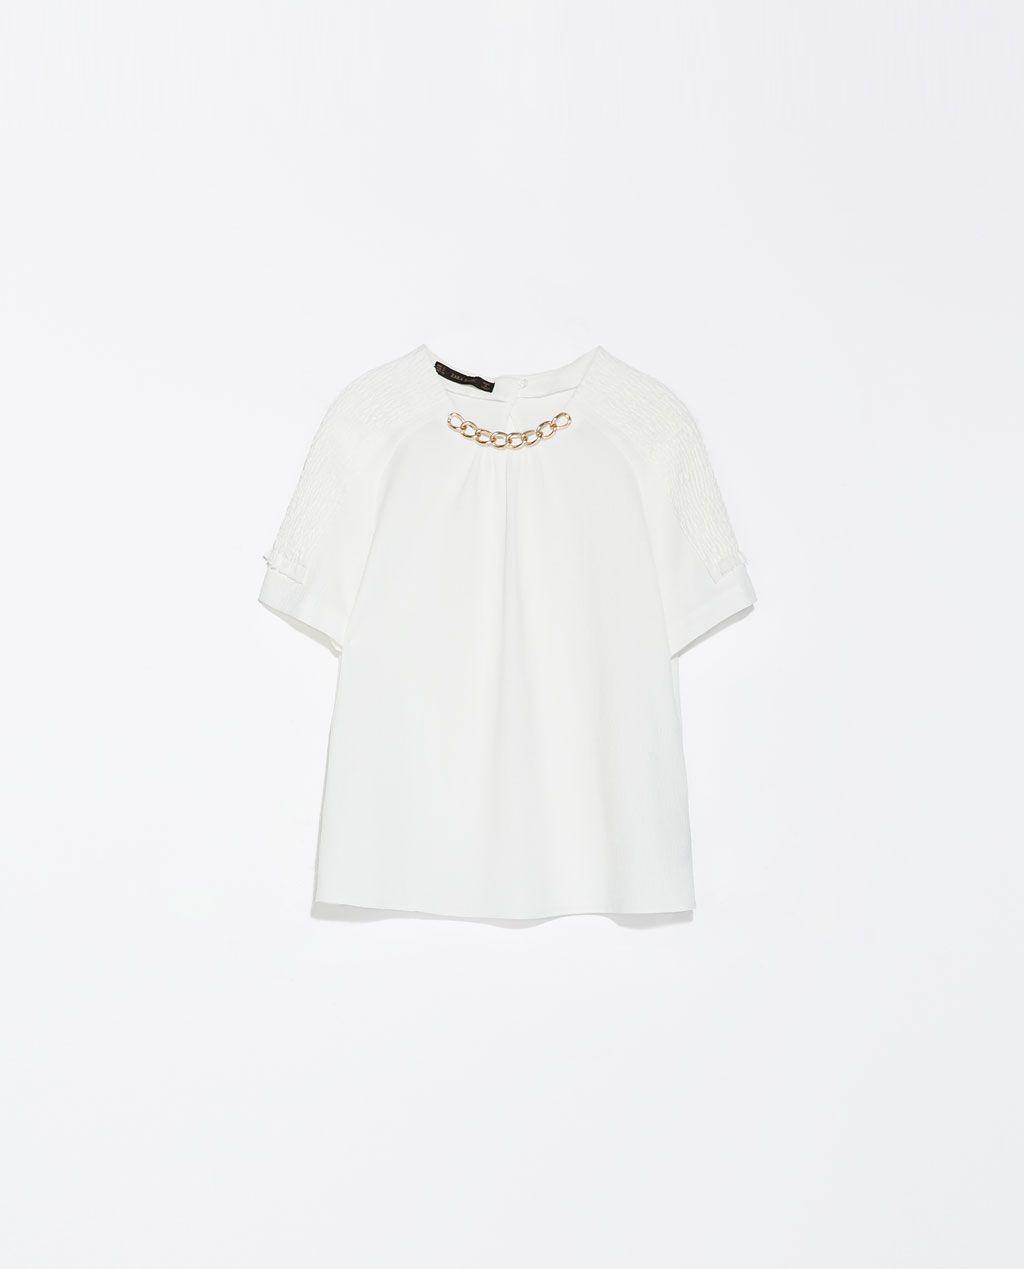 Zara $20   http://www.zara.com/us/en/woman/shirts/top-with-smock-collar-c358004p1784019.html